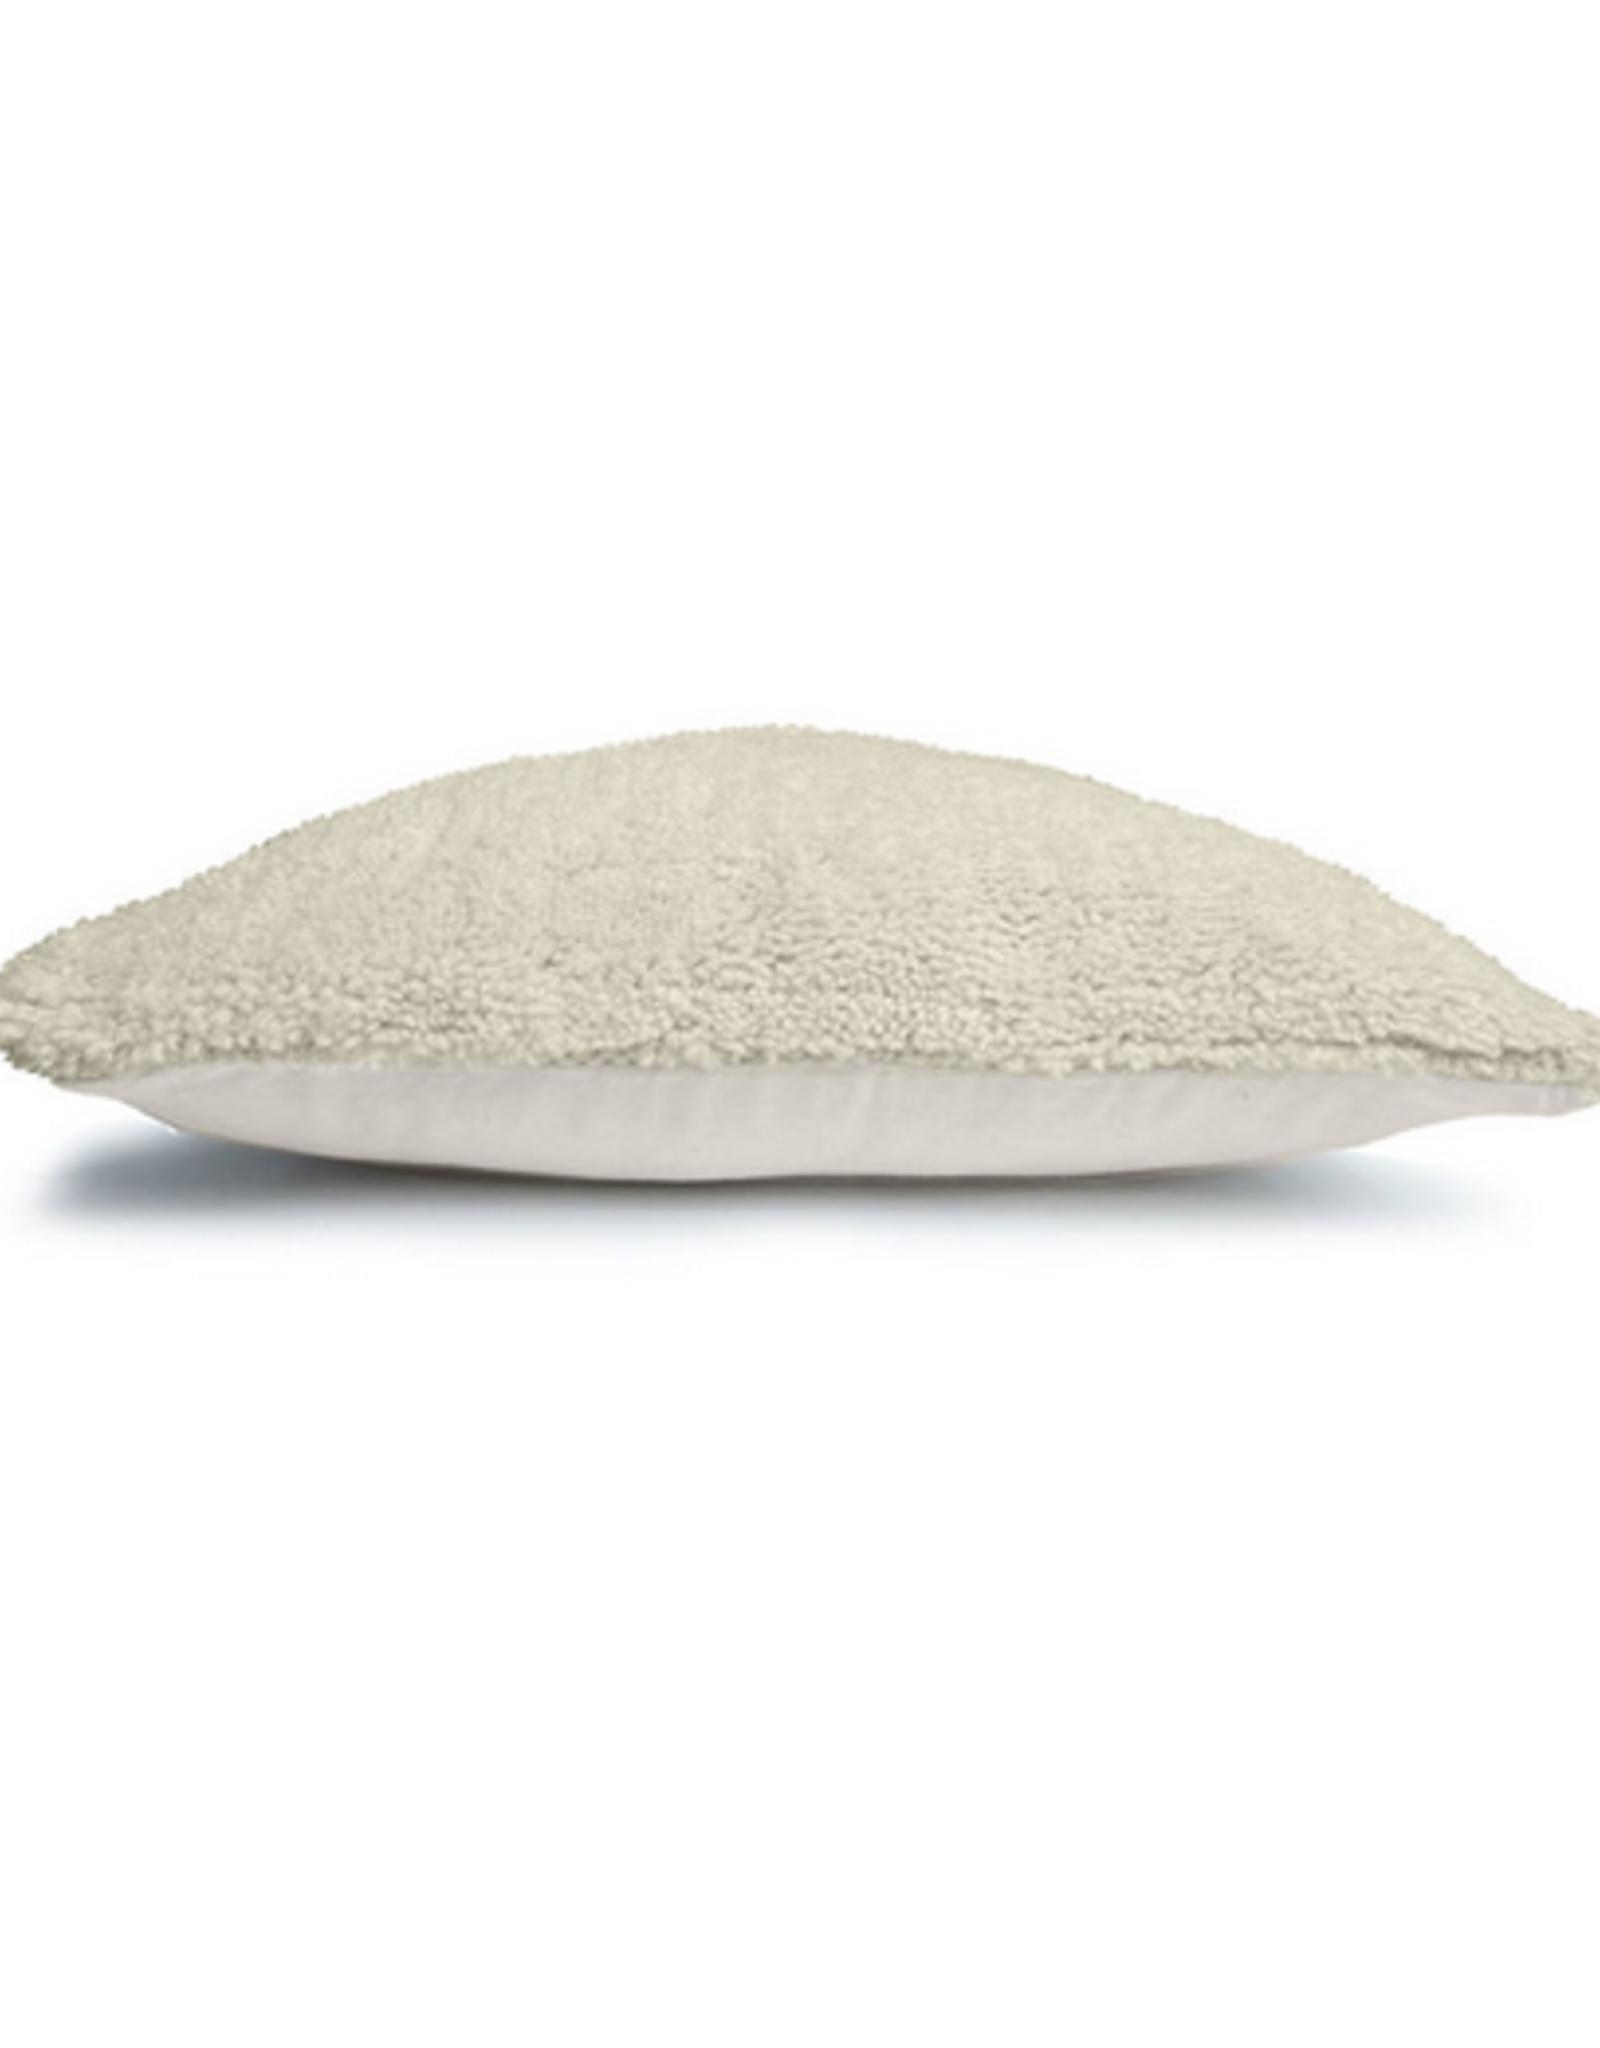 Malagoon Malagoon - Turfed solid cushion - ivory white